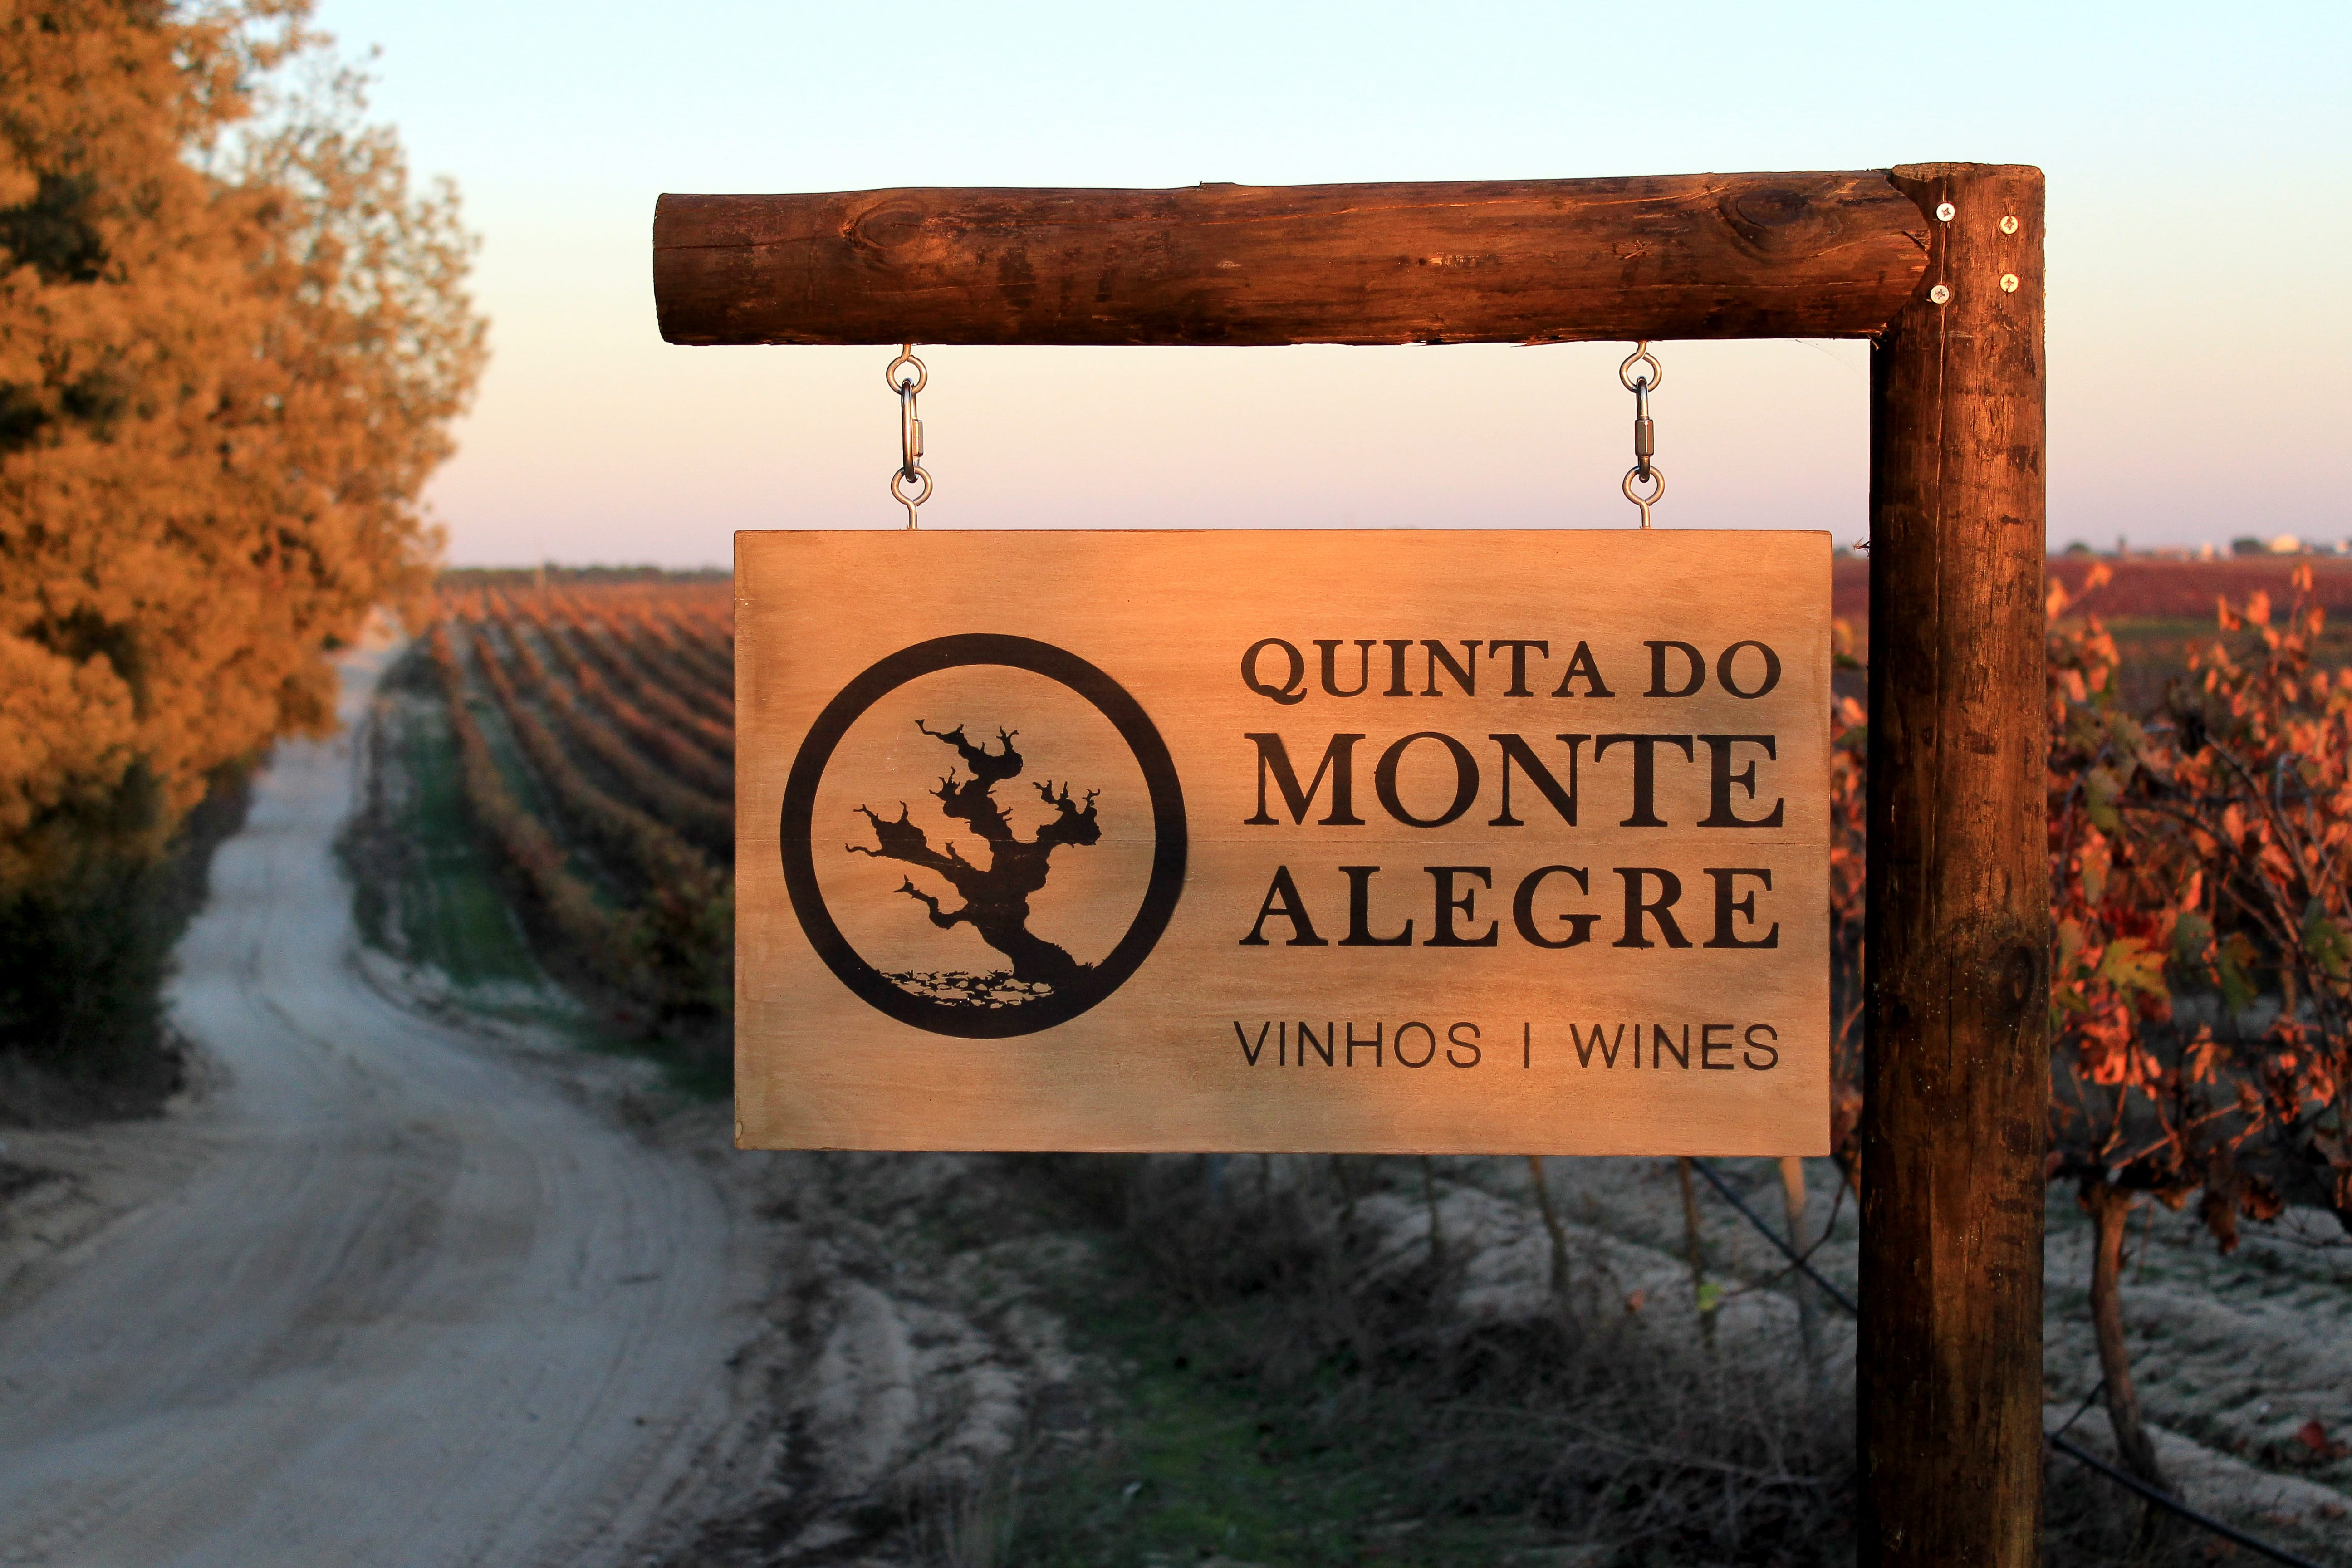 Quinta do Monte Alegre - Cata & Visita Guiada